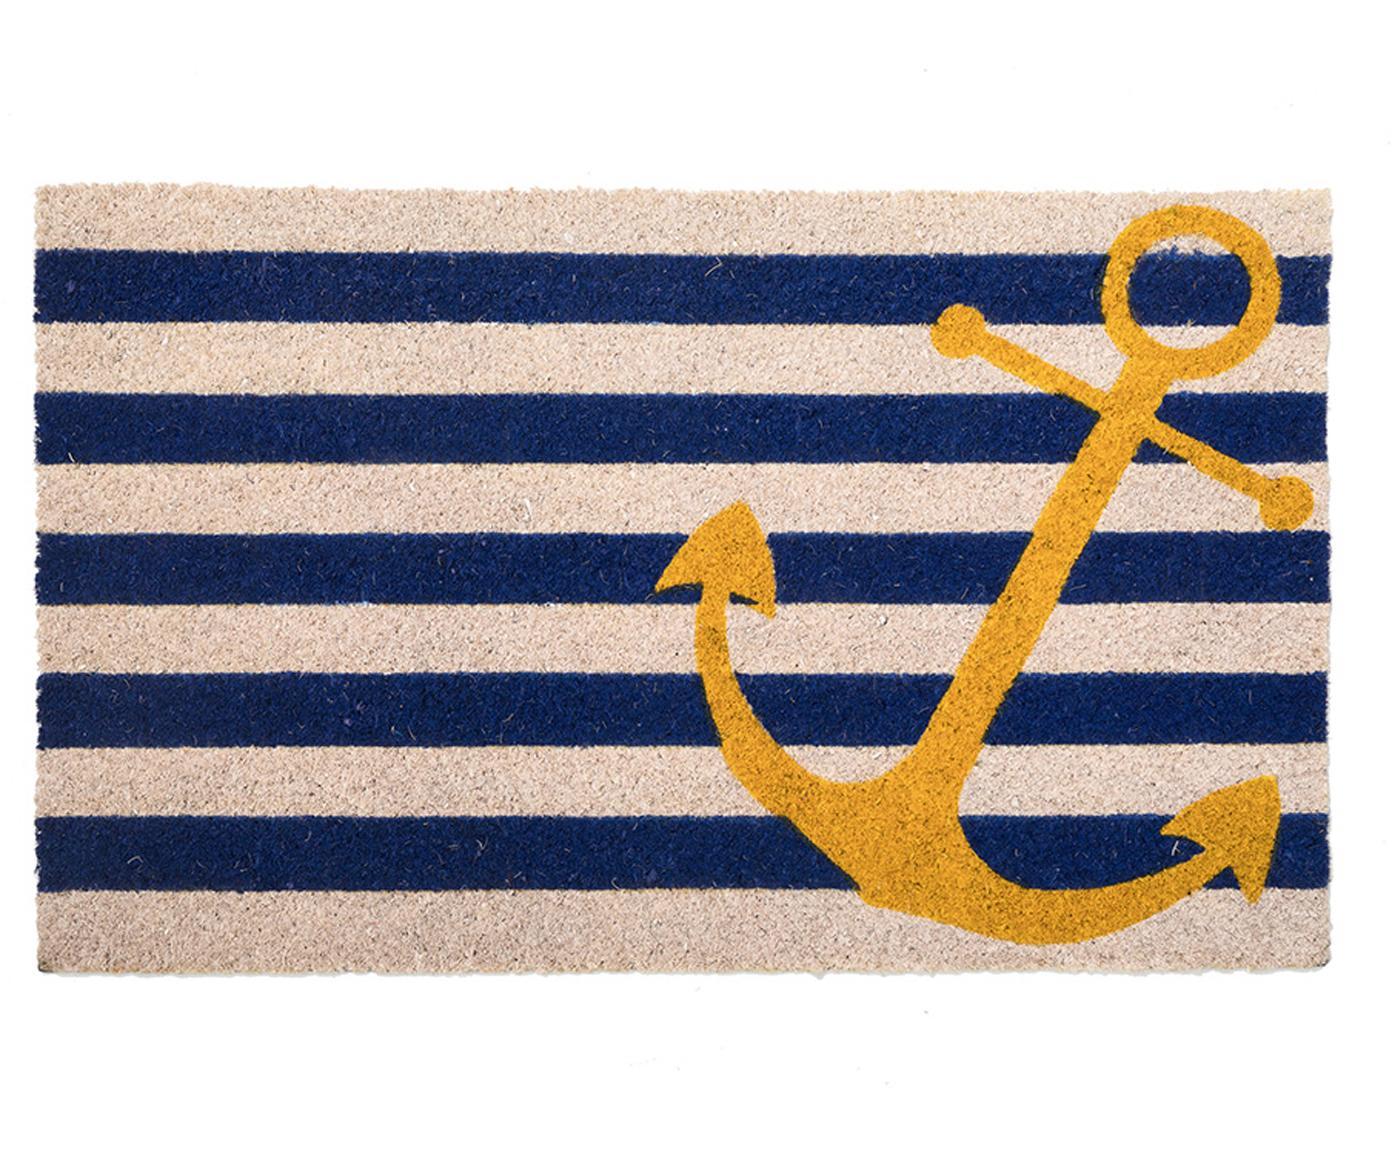 Deurmat Yellow Anchor, Kokosvezels, Lichtbeige, blauw, geel, 45 x 75 cm